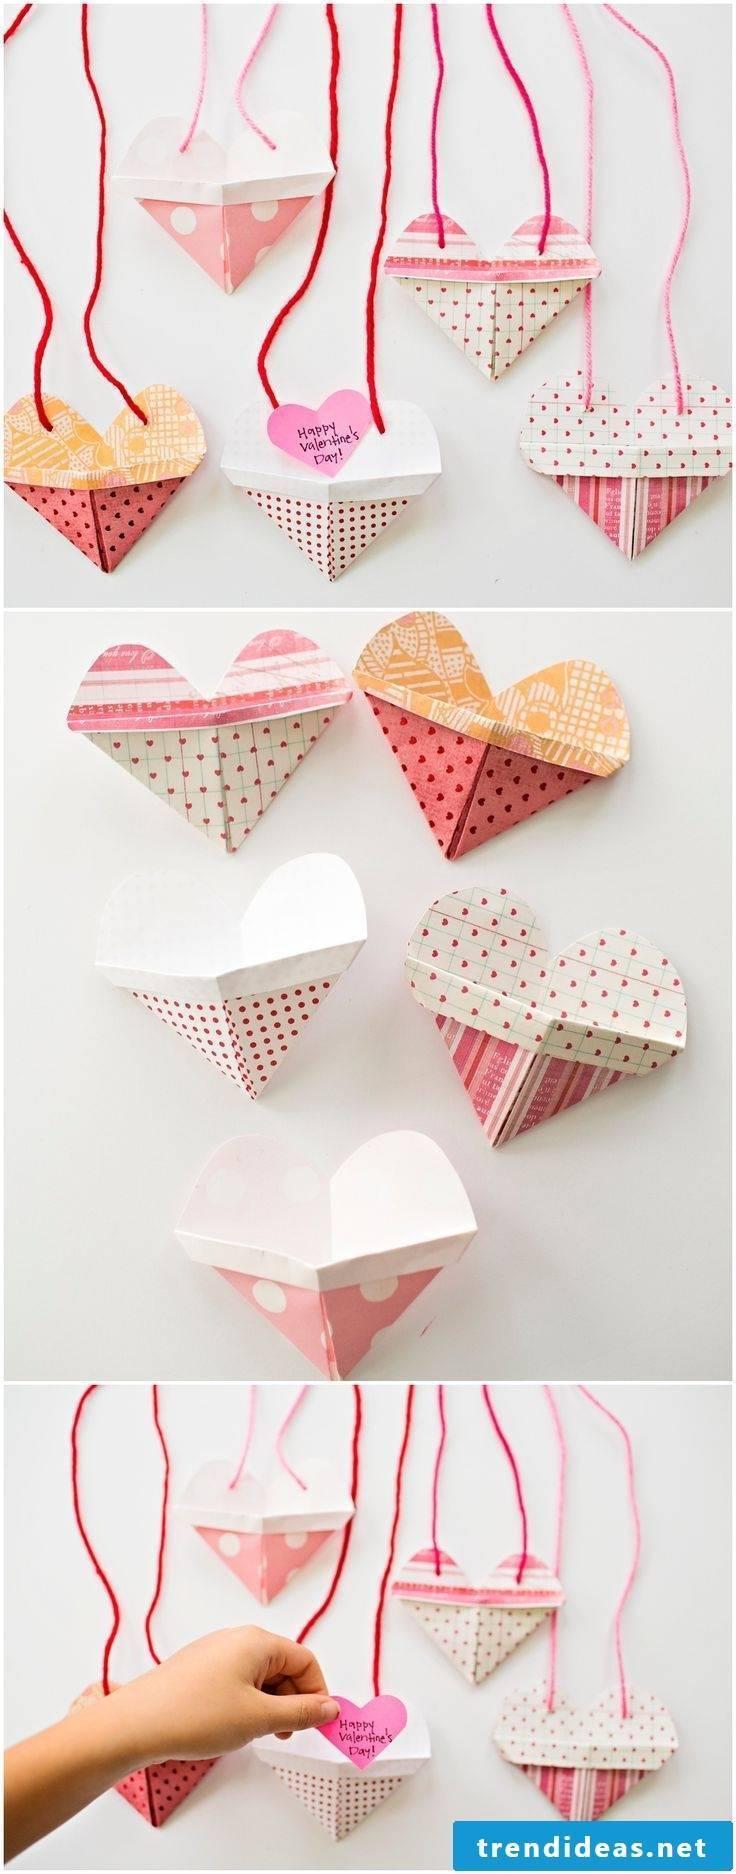 Envelope fold Valentine's Day